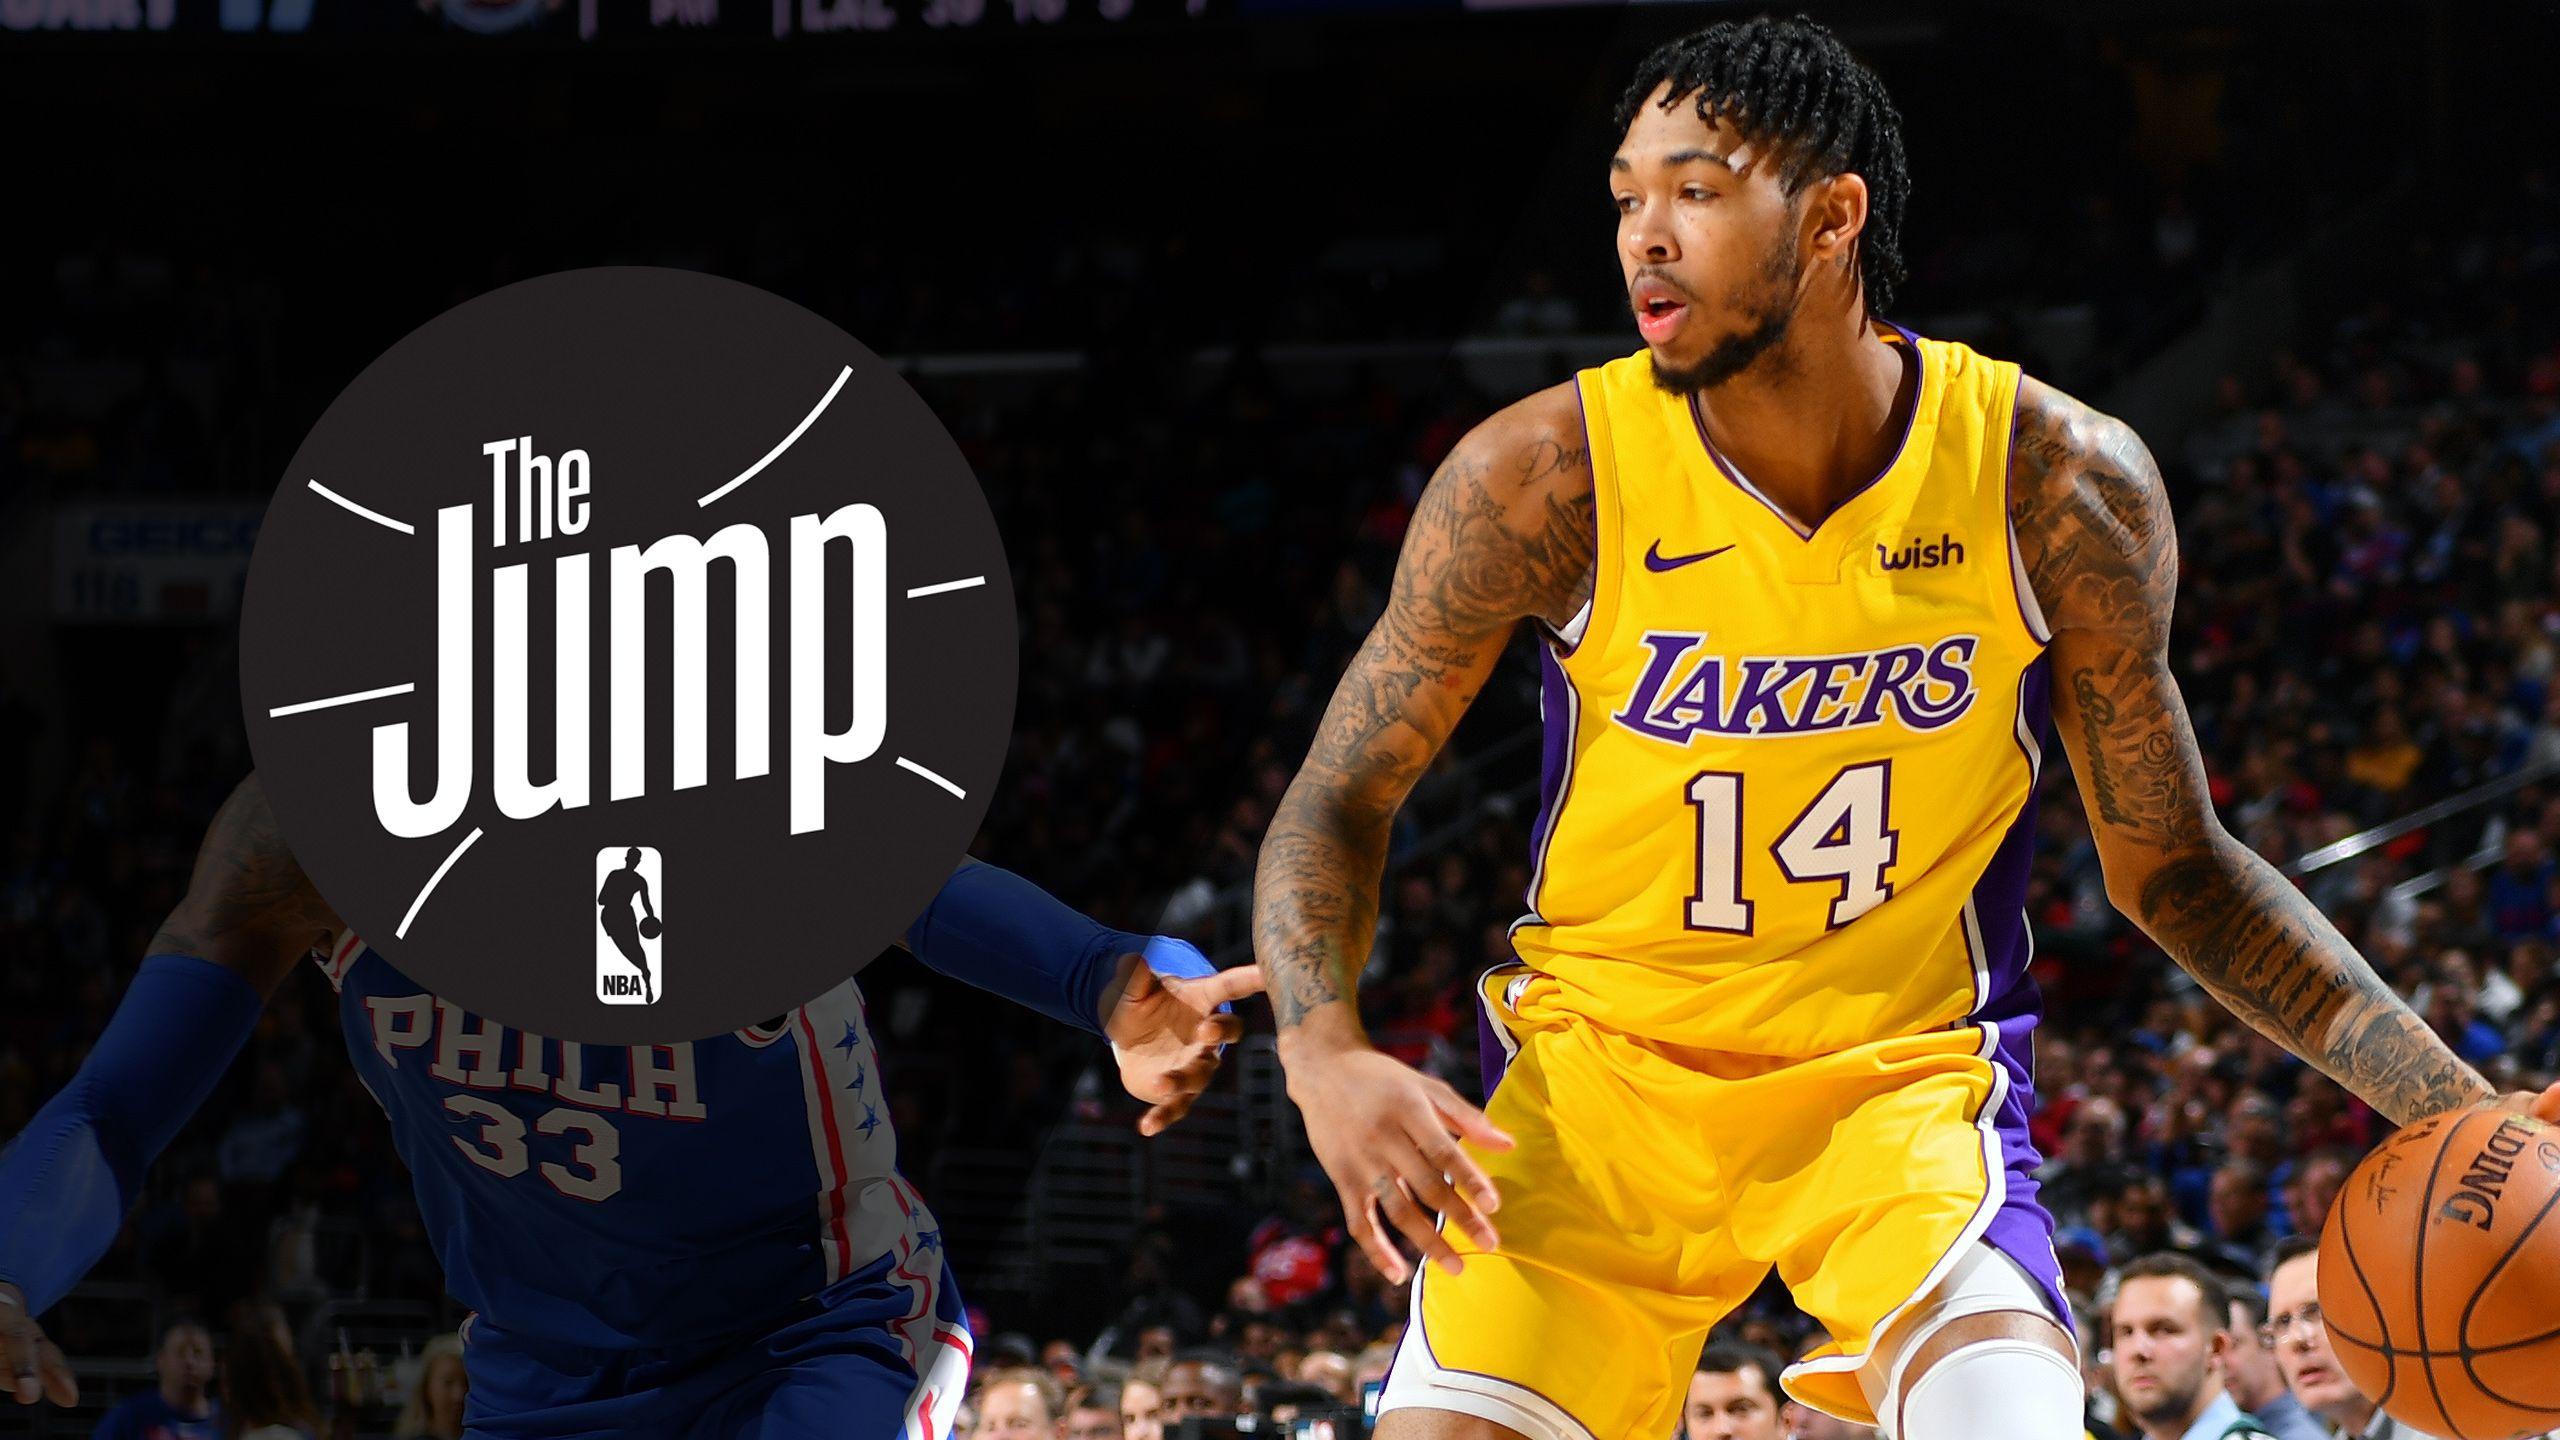 Fri, 12/8 - NBA: The Jump